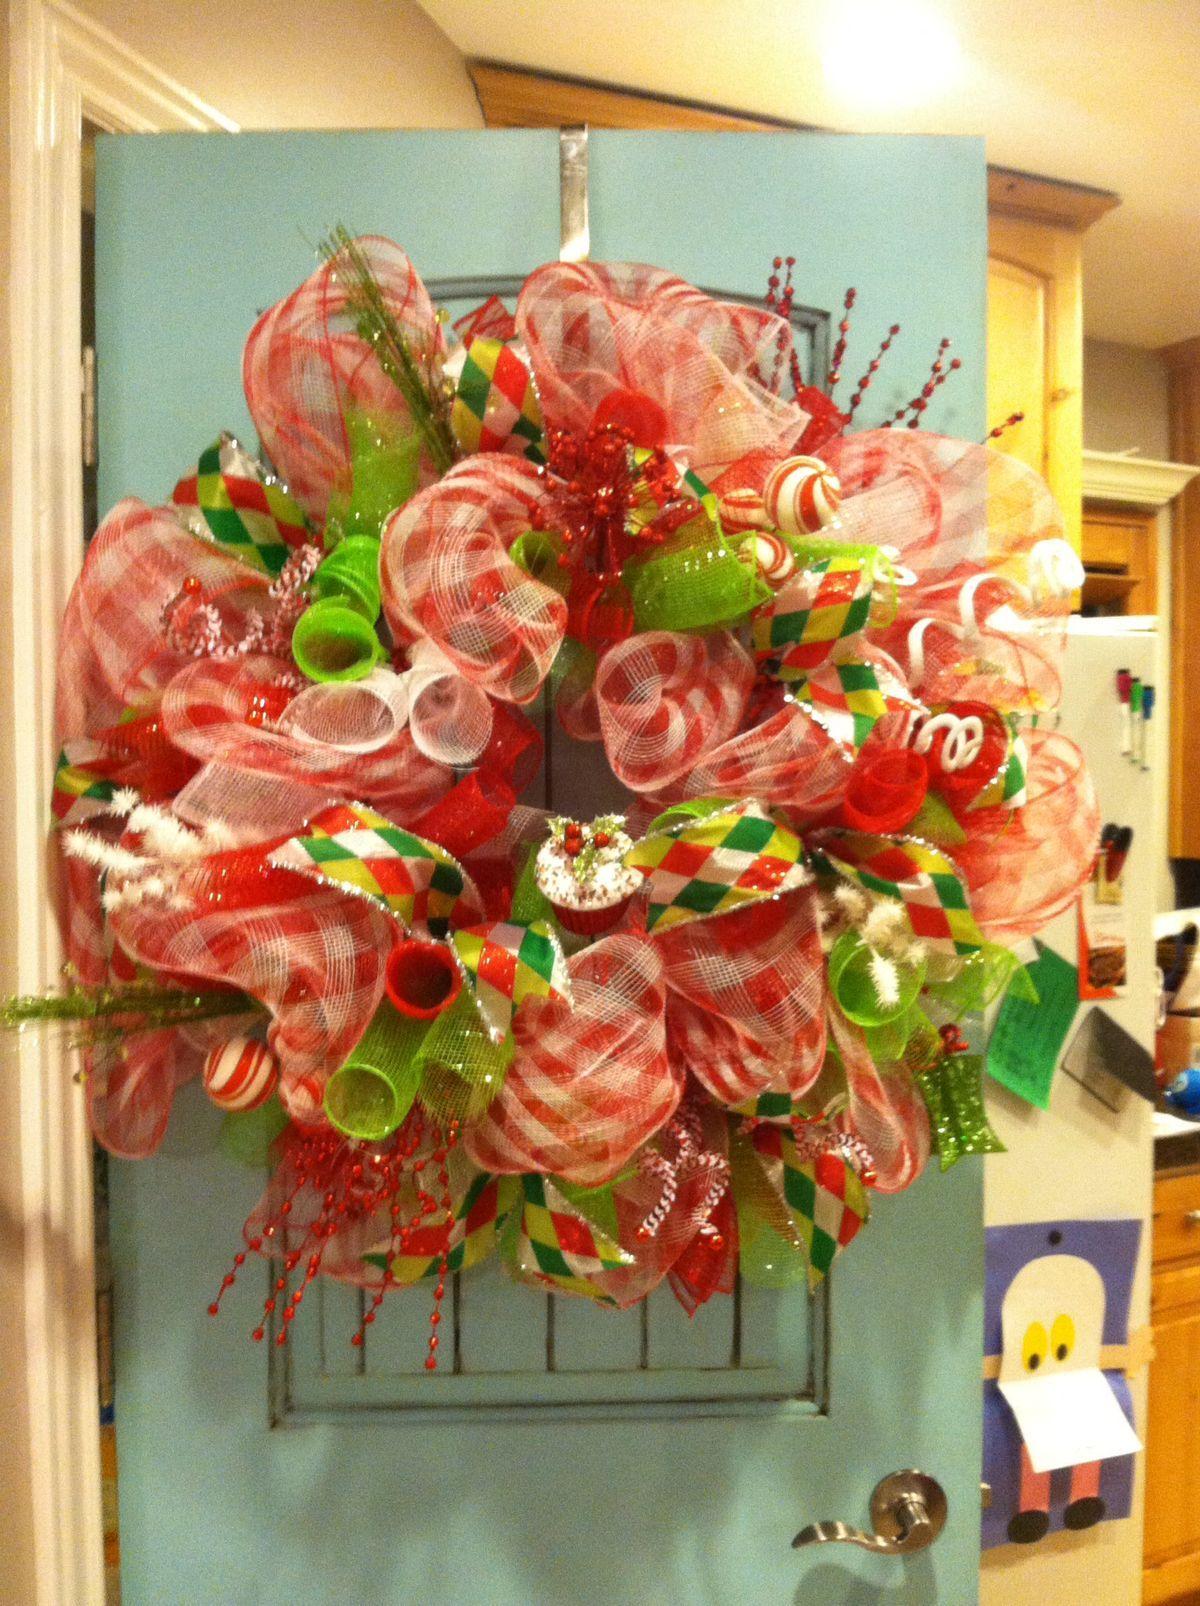 New Christmas Wreath Diy Crafting  See More Amazing Diy